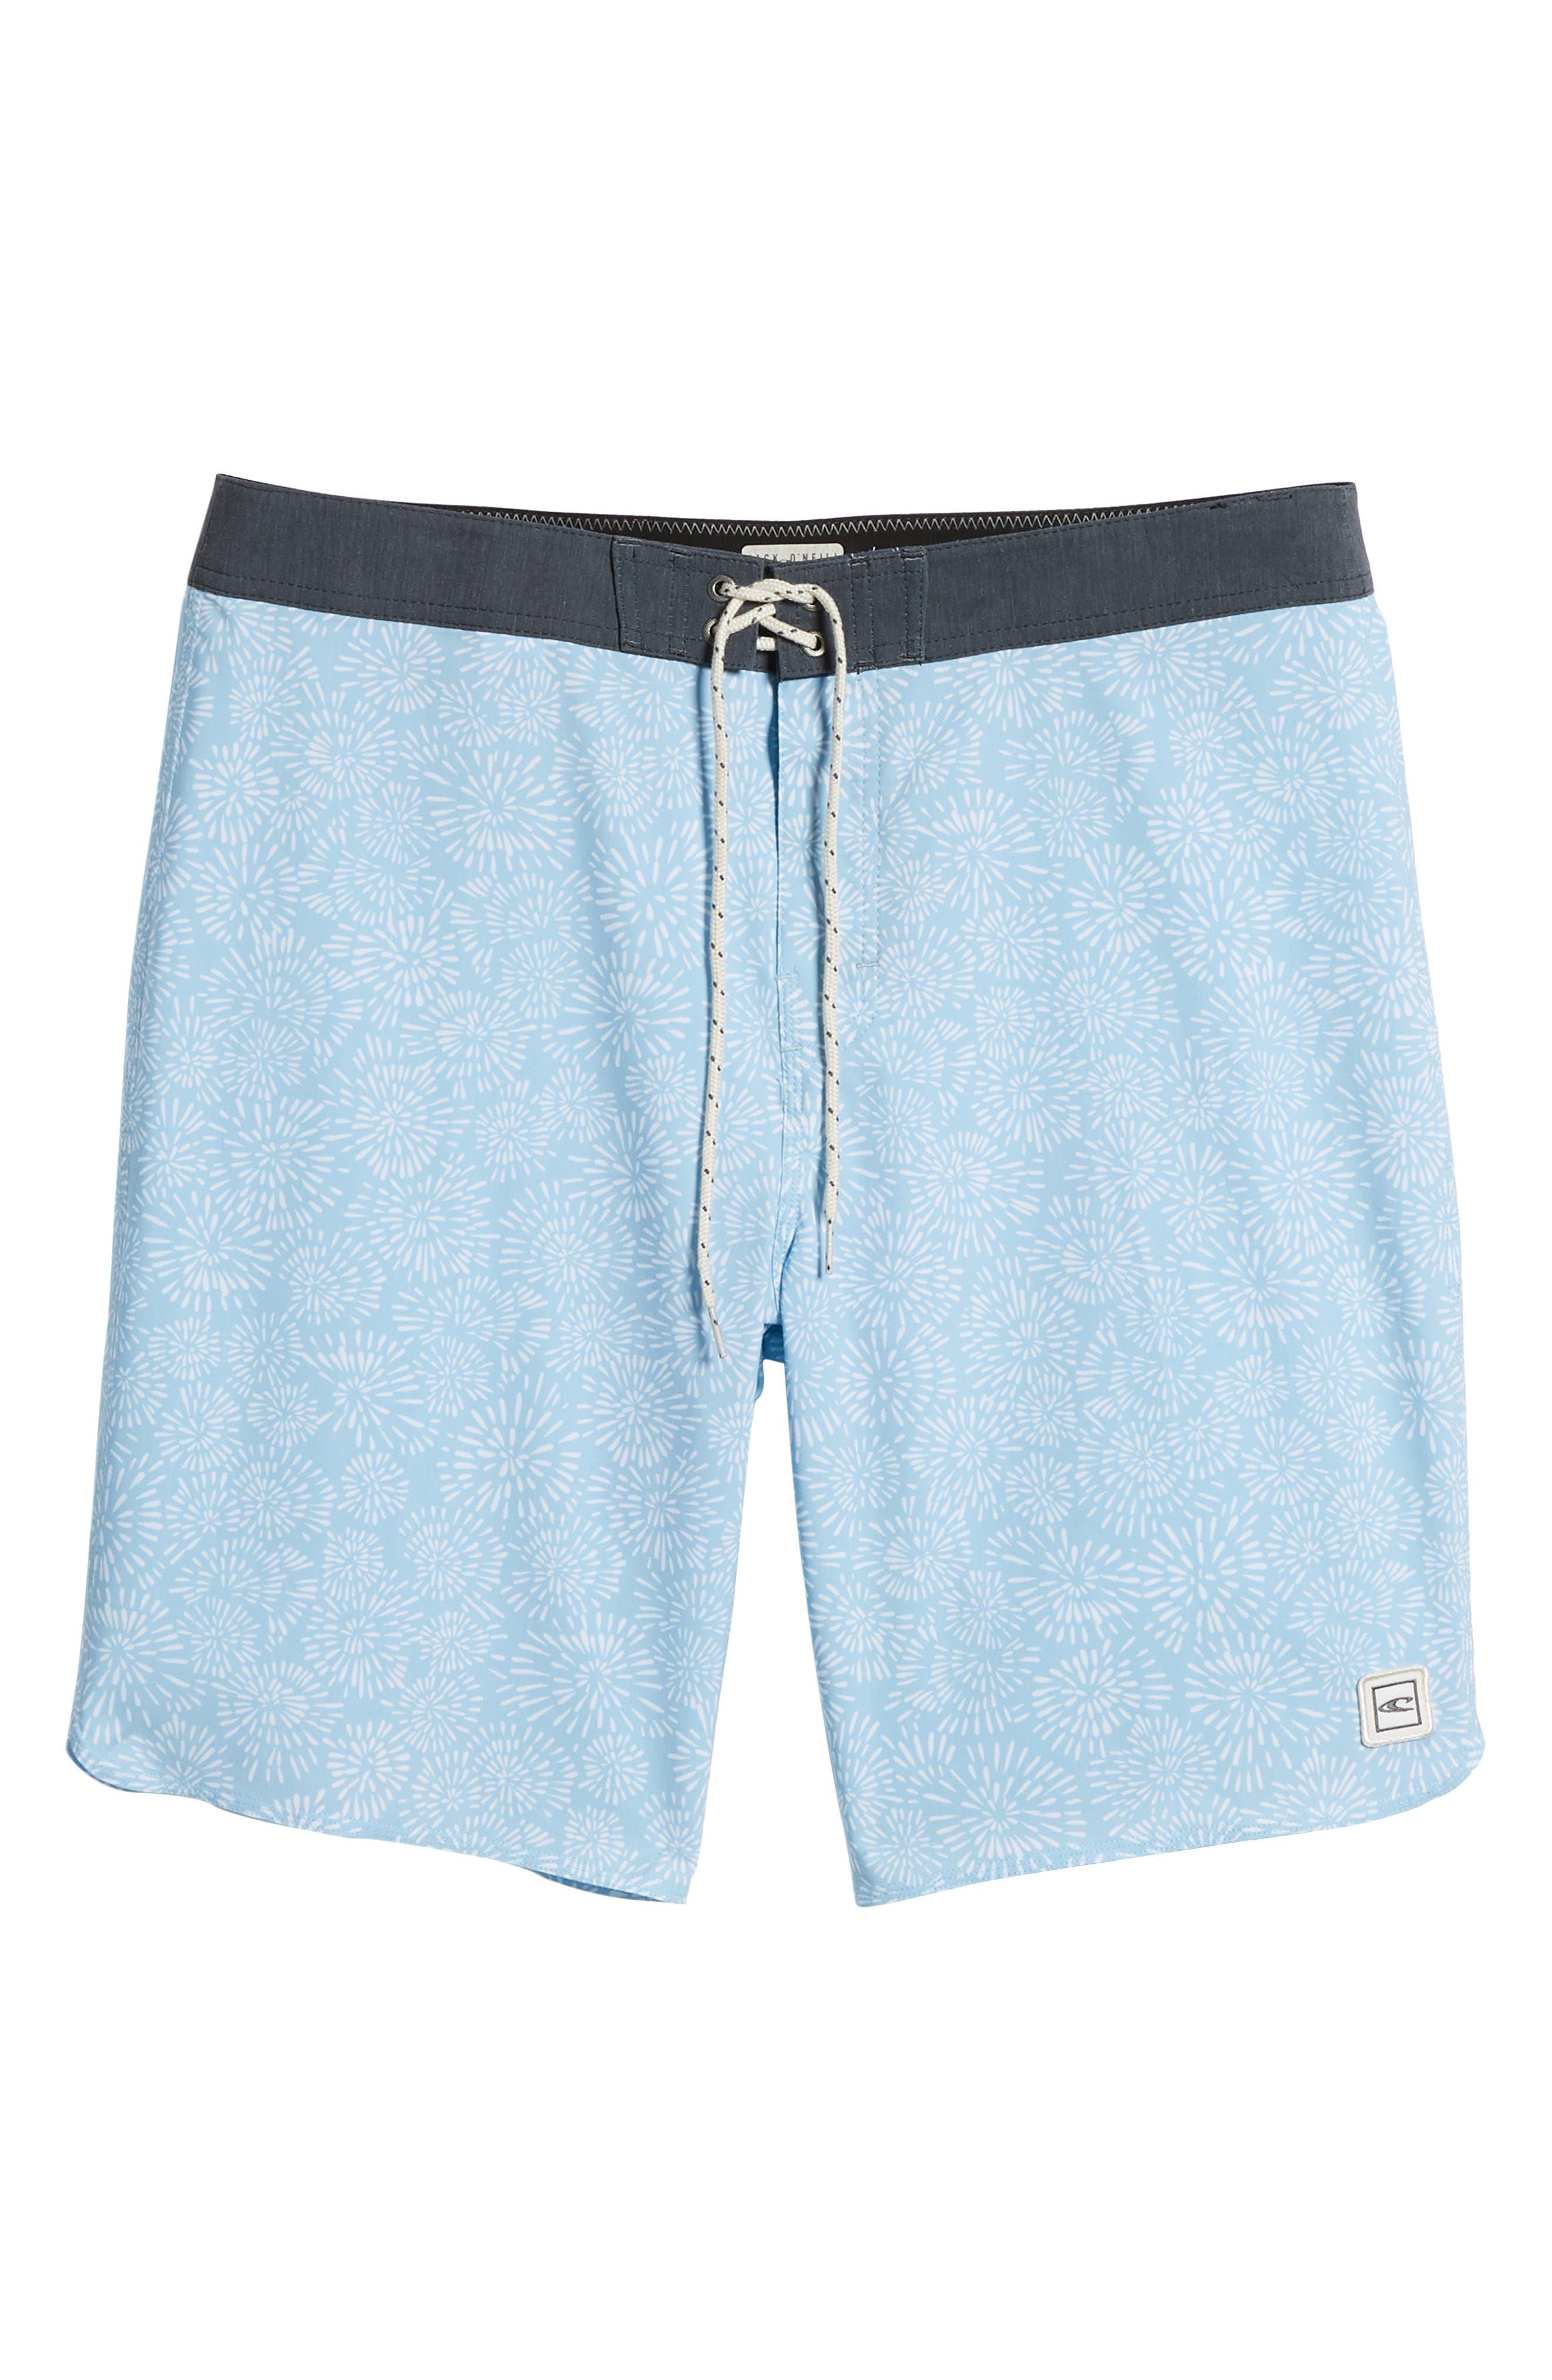 Waterfront Board Shorts,                             Alternate thumbnail 6, color,                             Light Blue